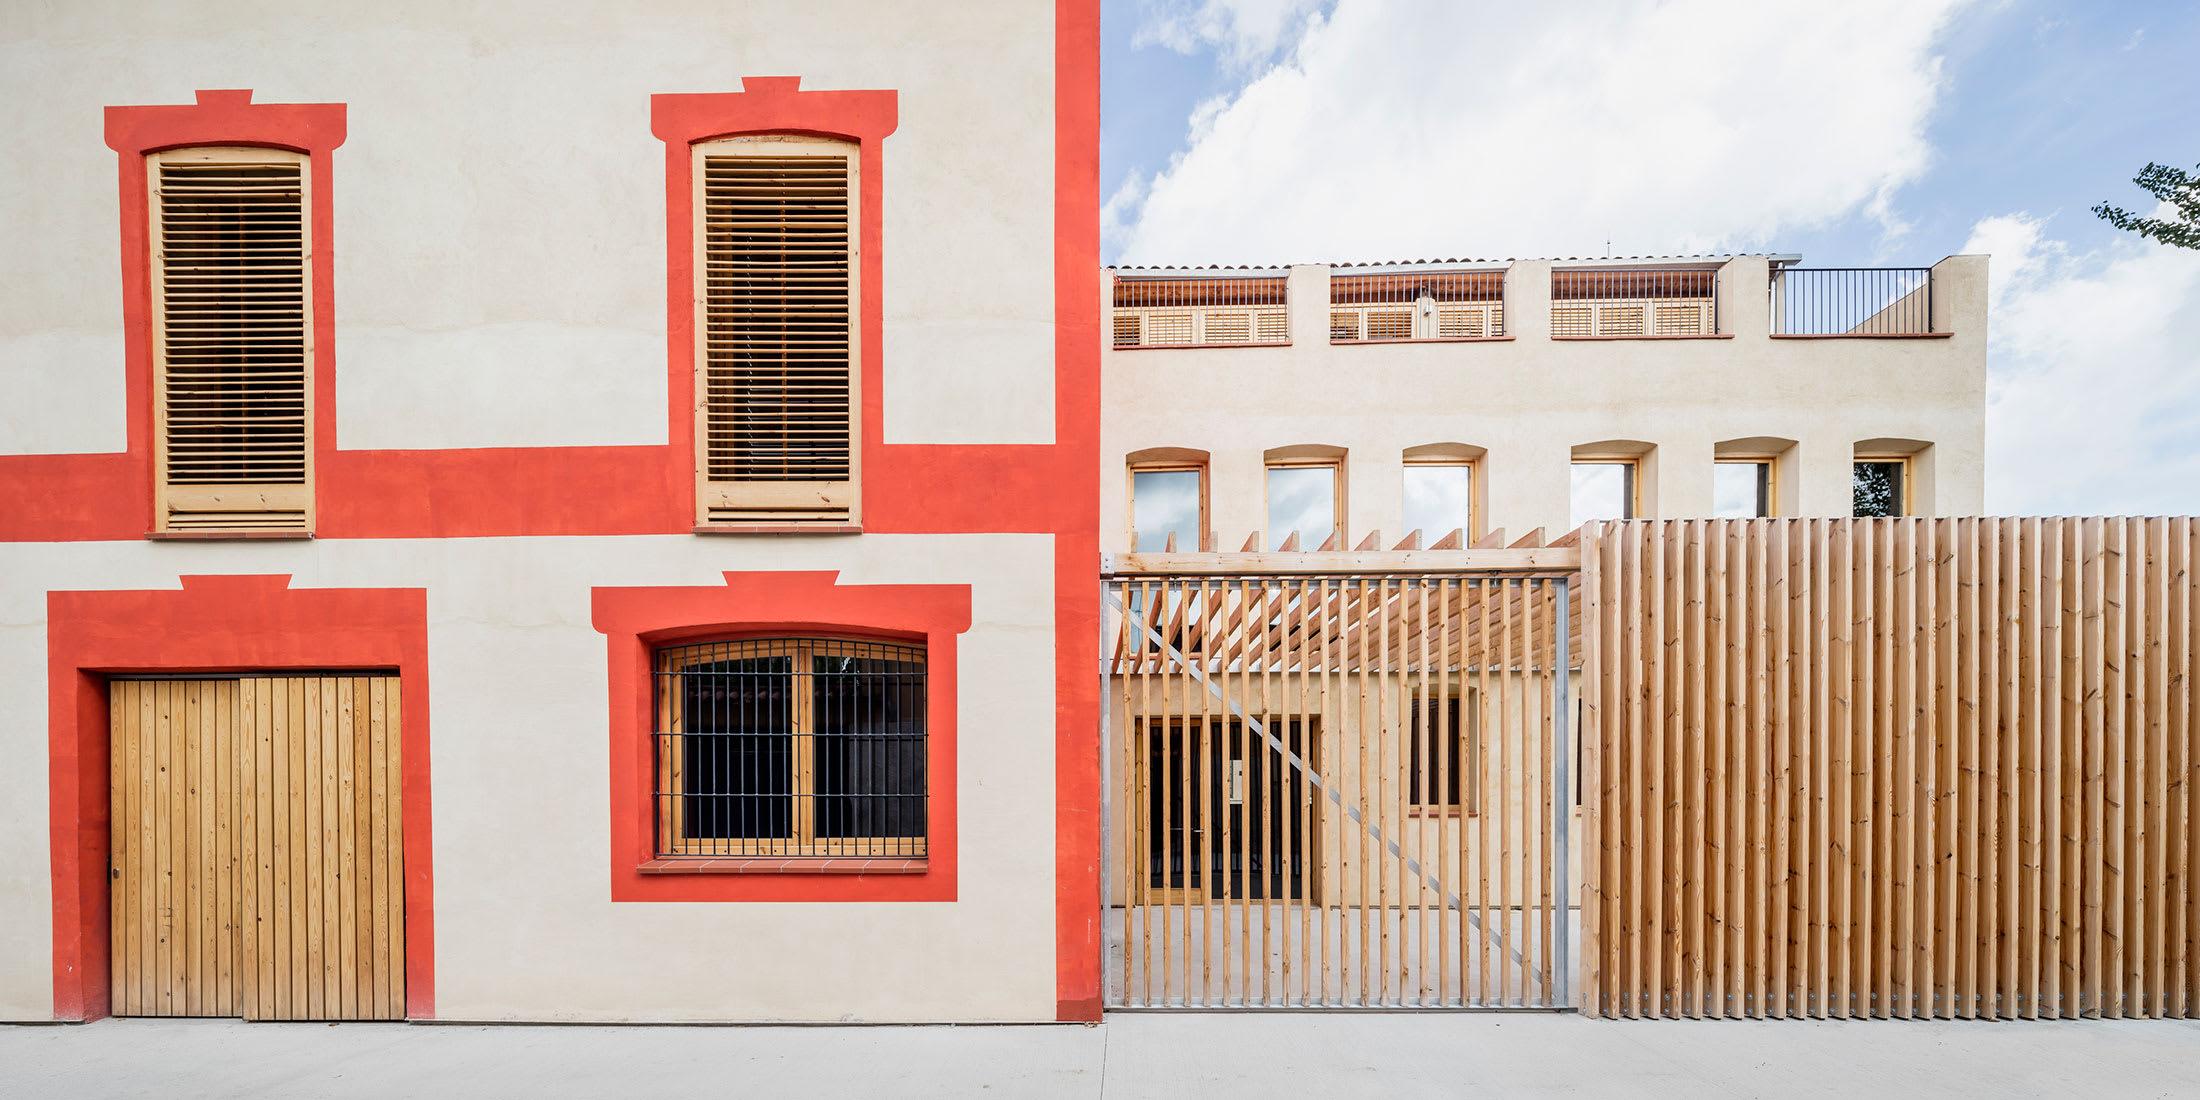 Taller 9S Arquitectes, Adrià Goula · Rehabilitation of old